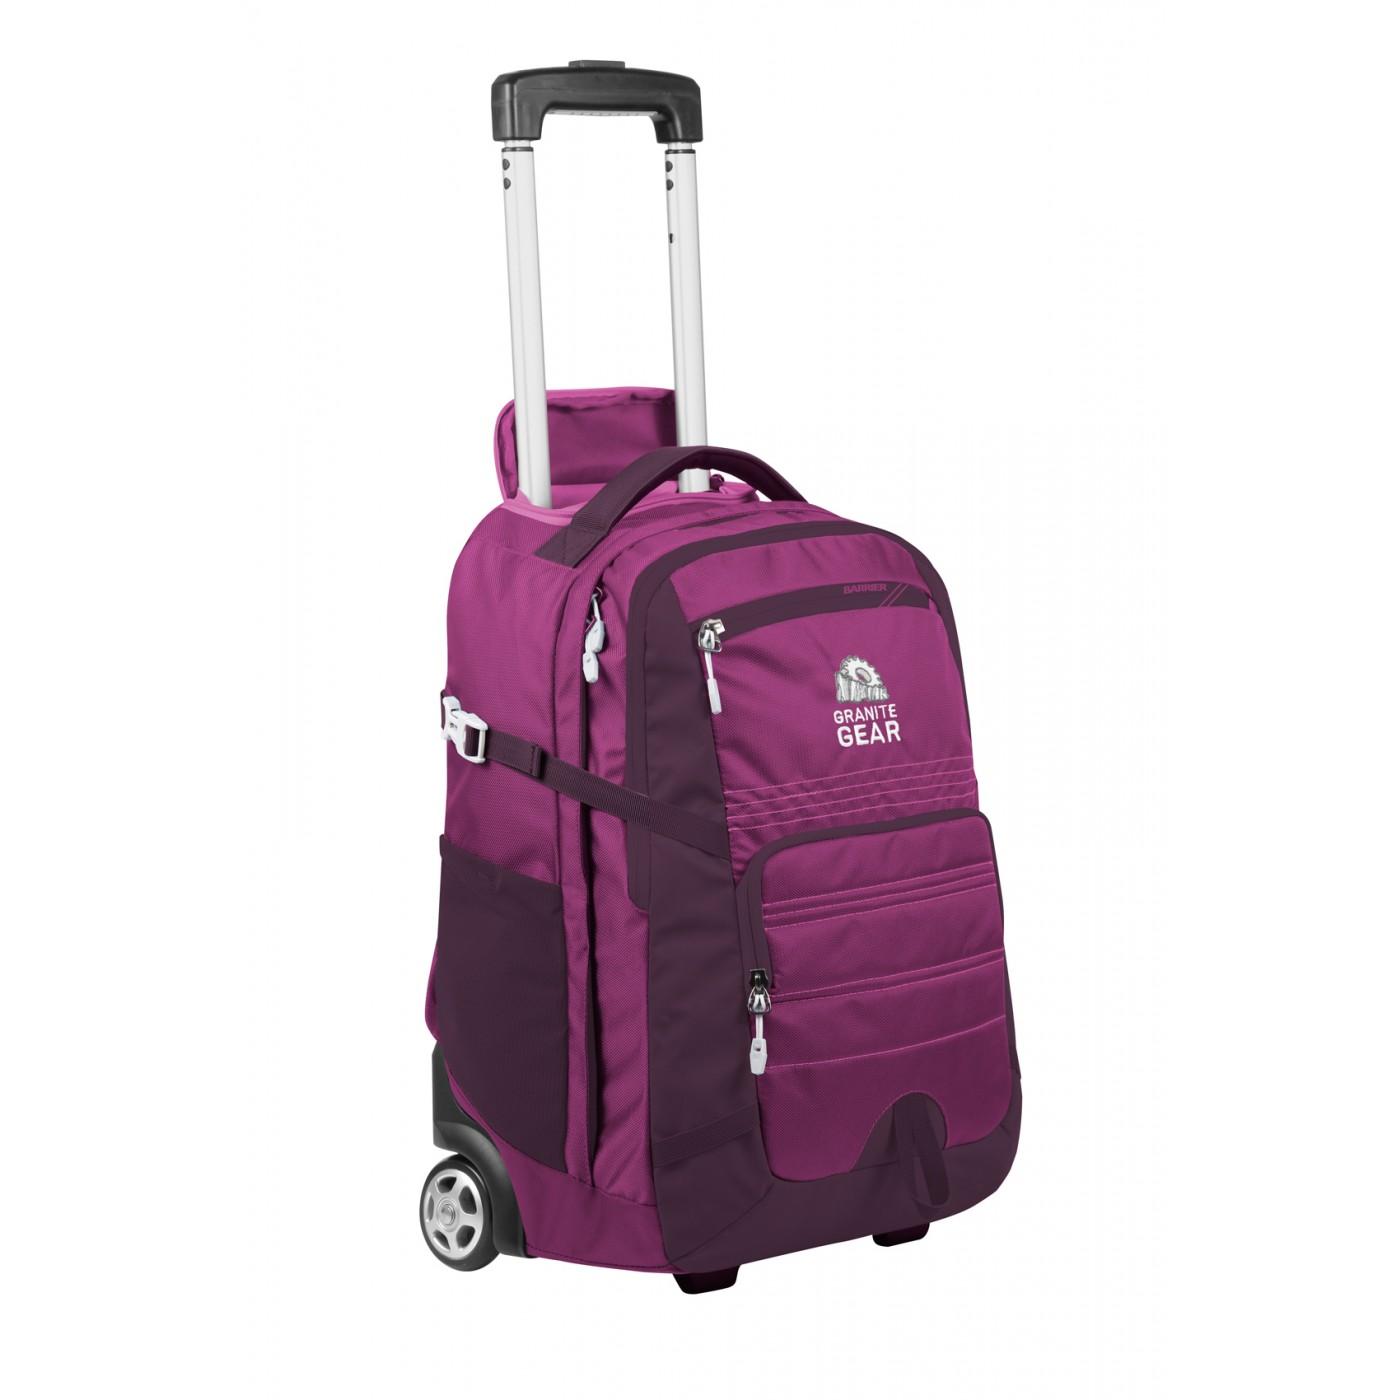 Haulsted | Rolling Backpacks | Granite Gear